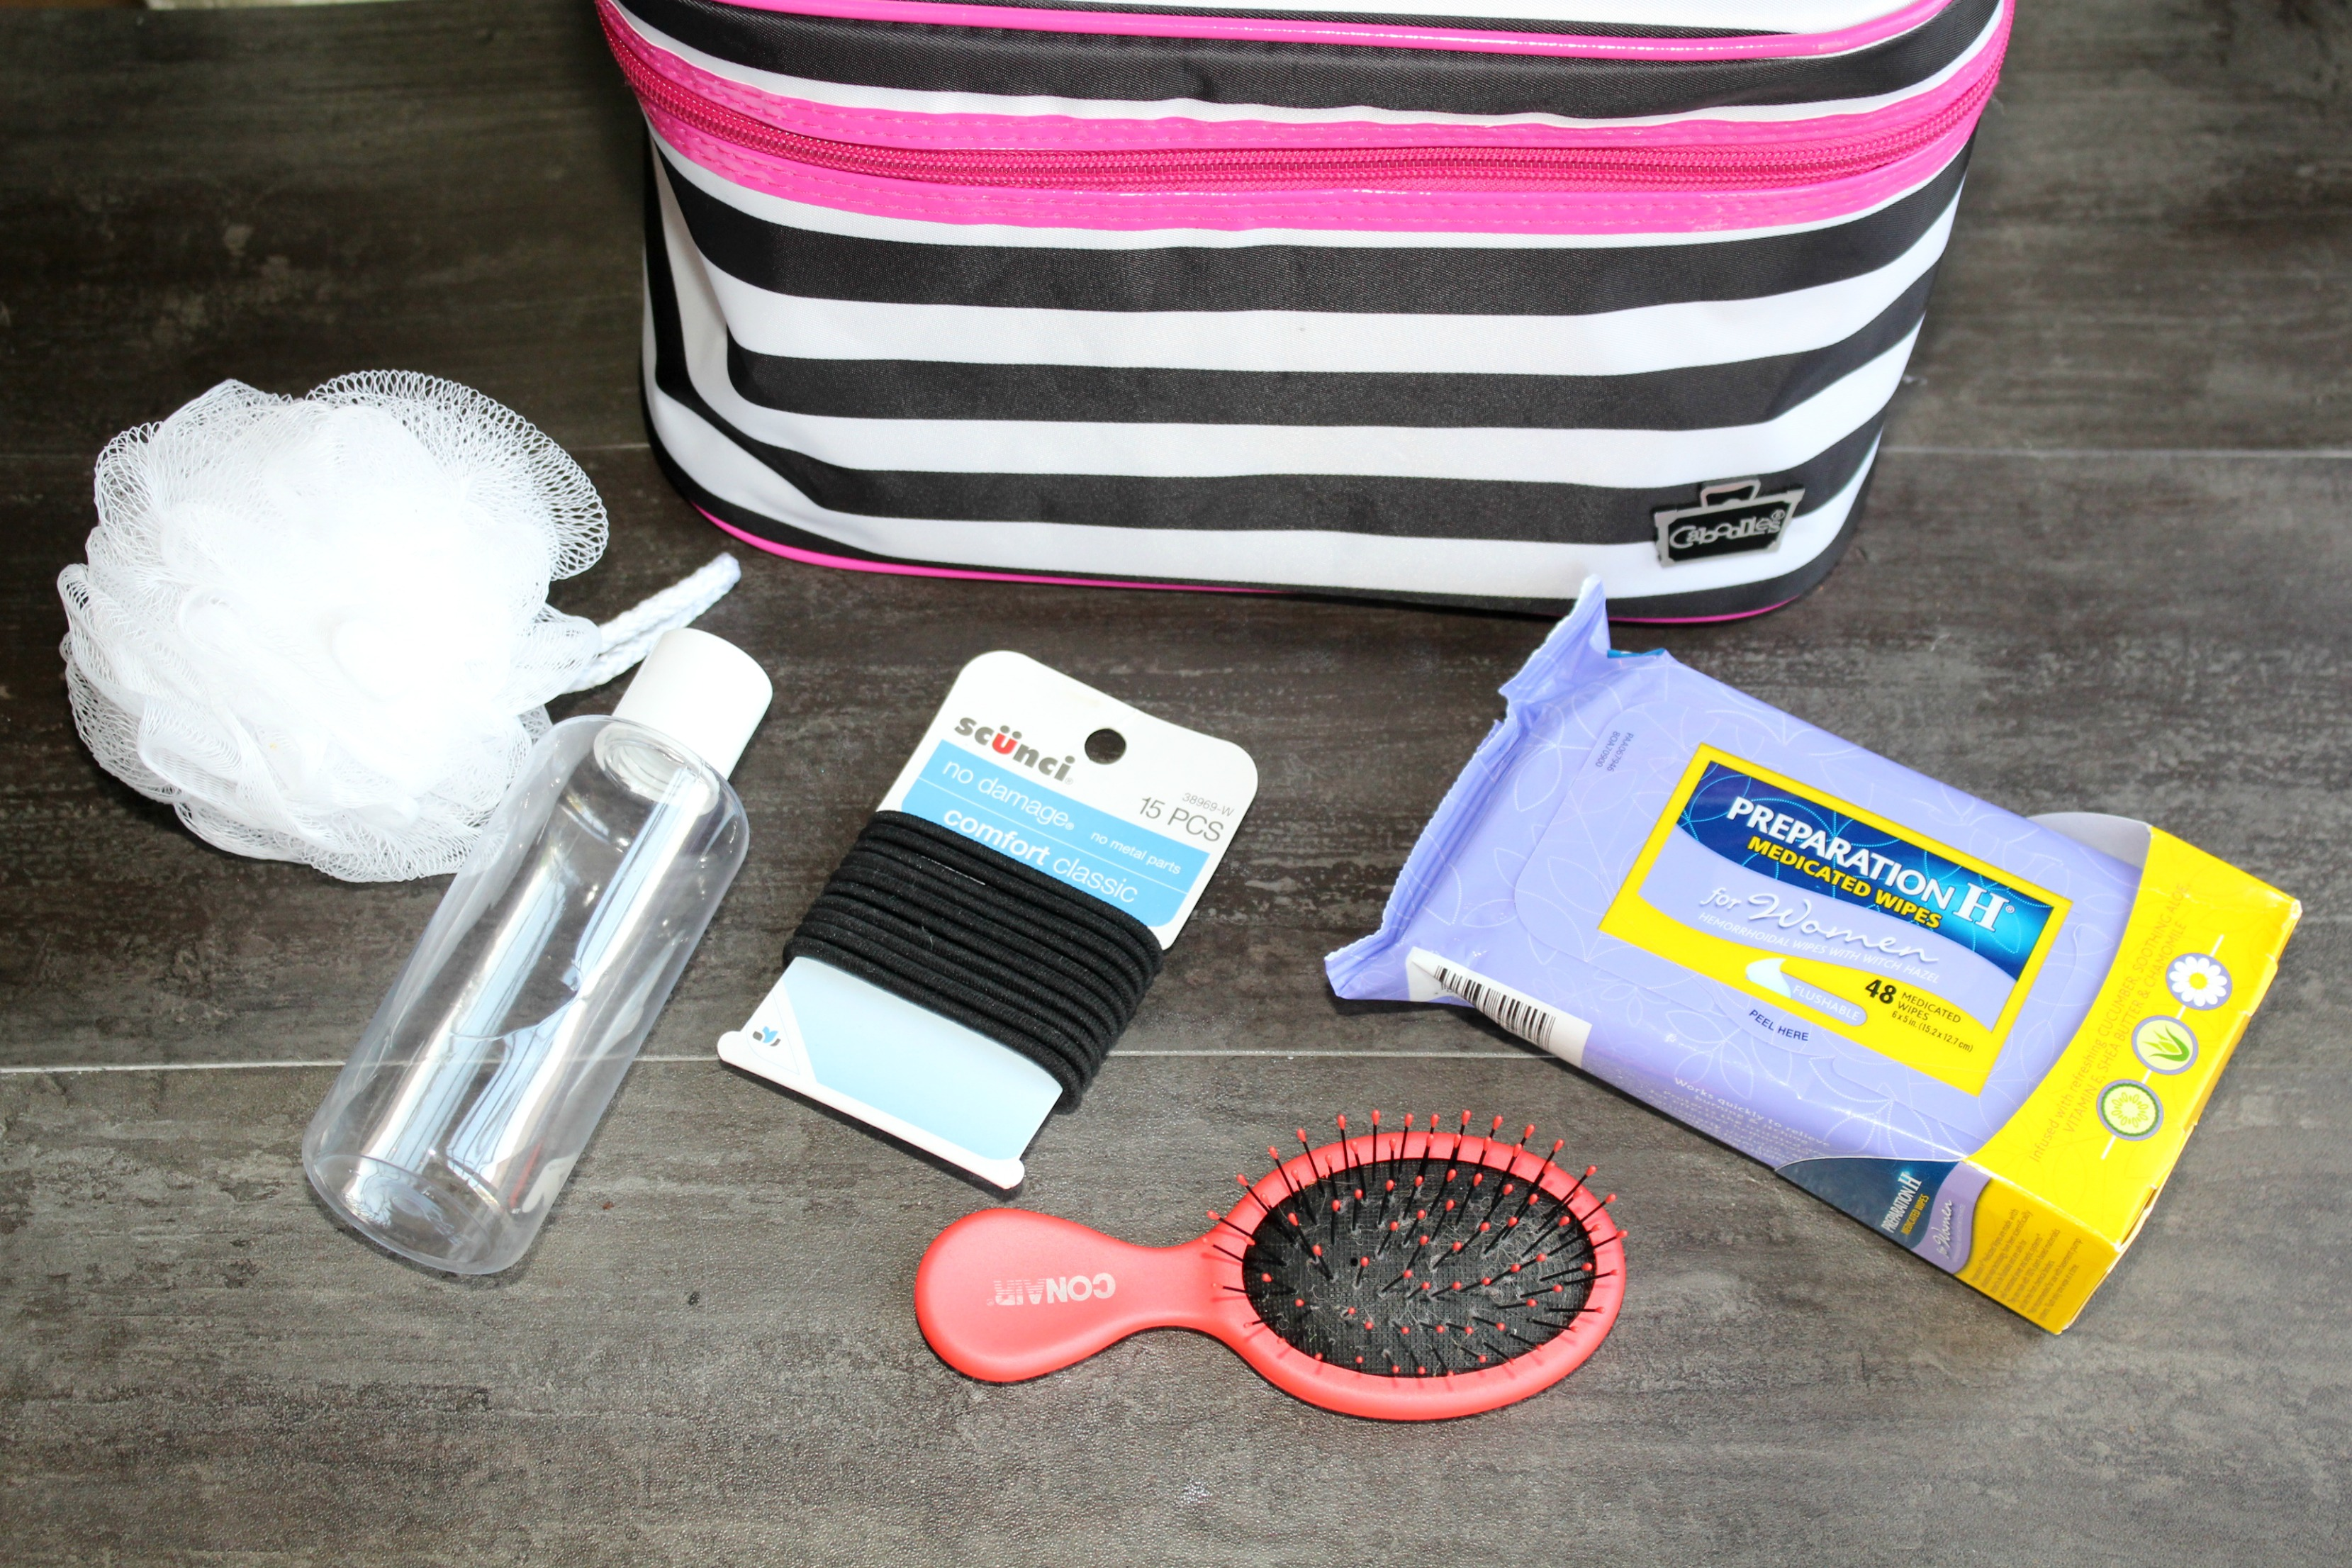 Postpartum Kit